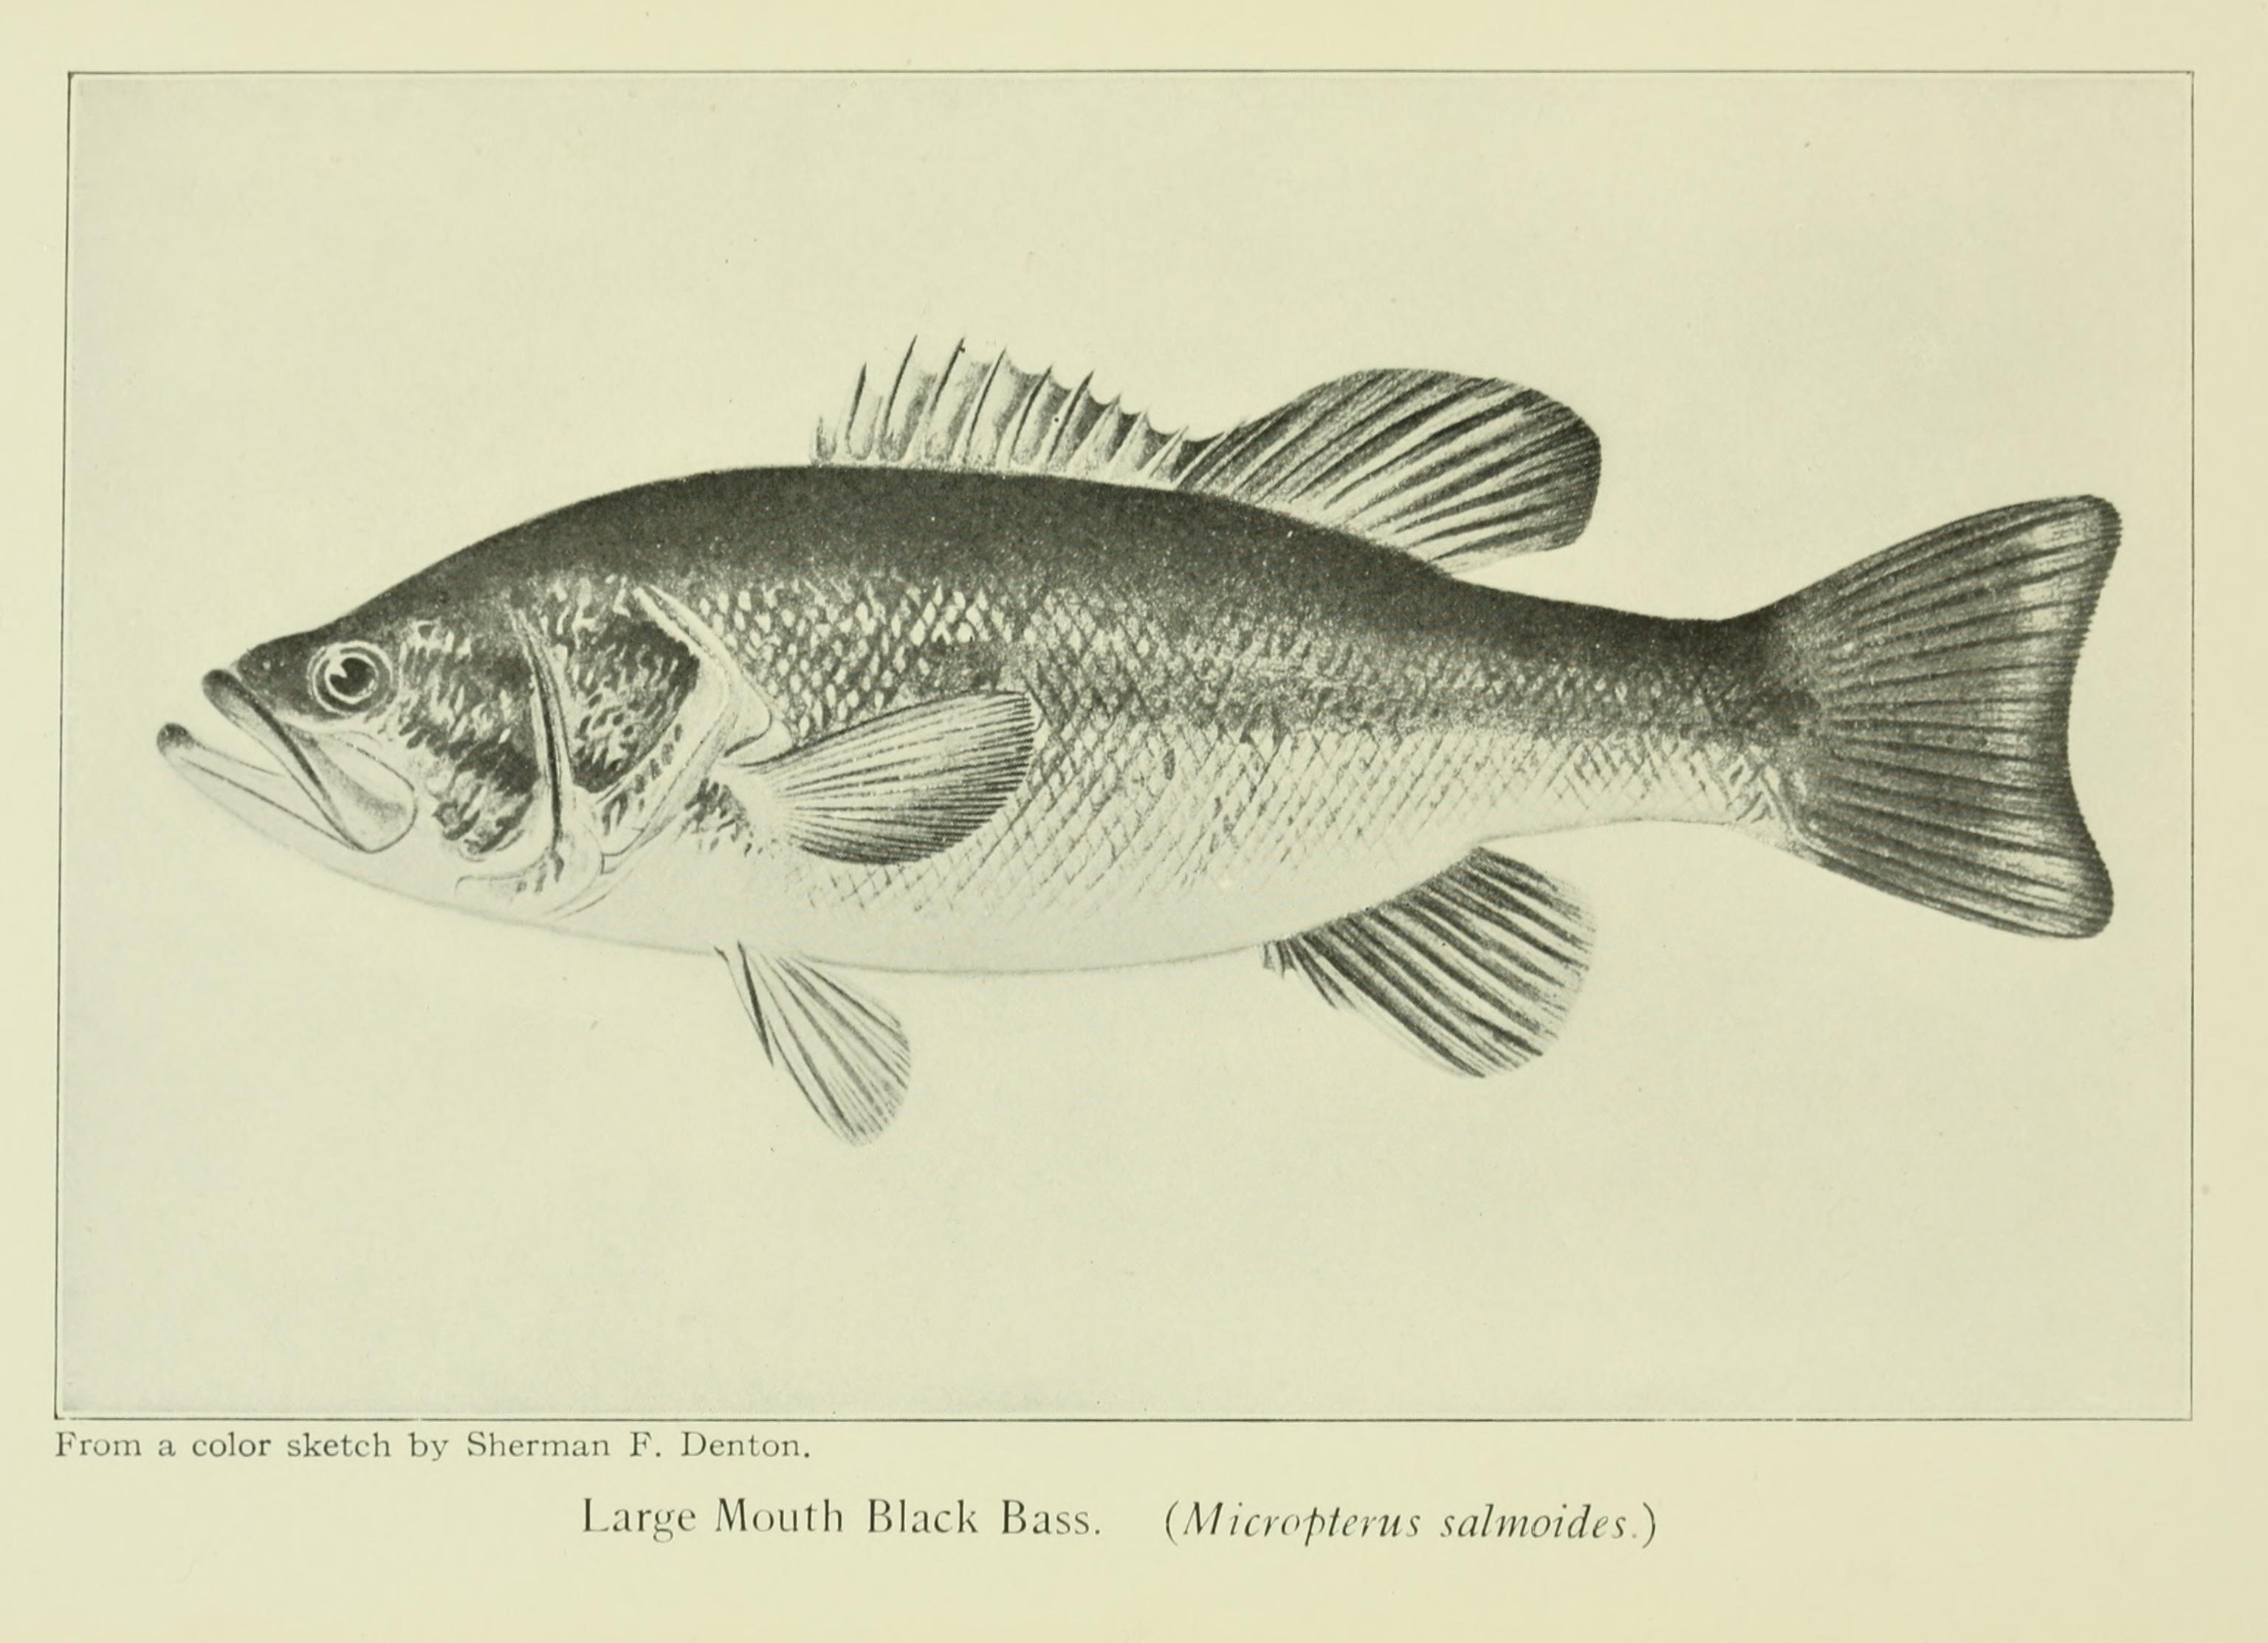 File:Favorite Fish and Fishing 03.jpg - Wikimedia Commons